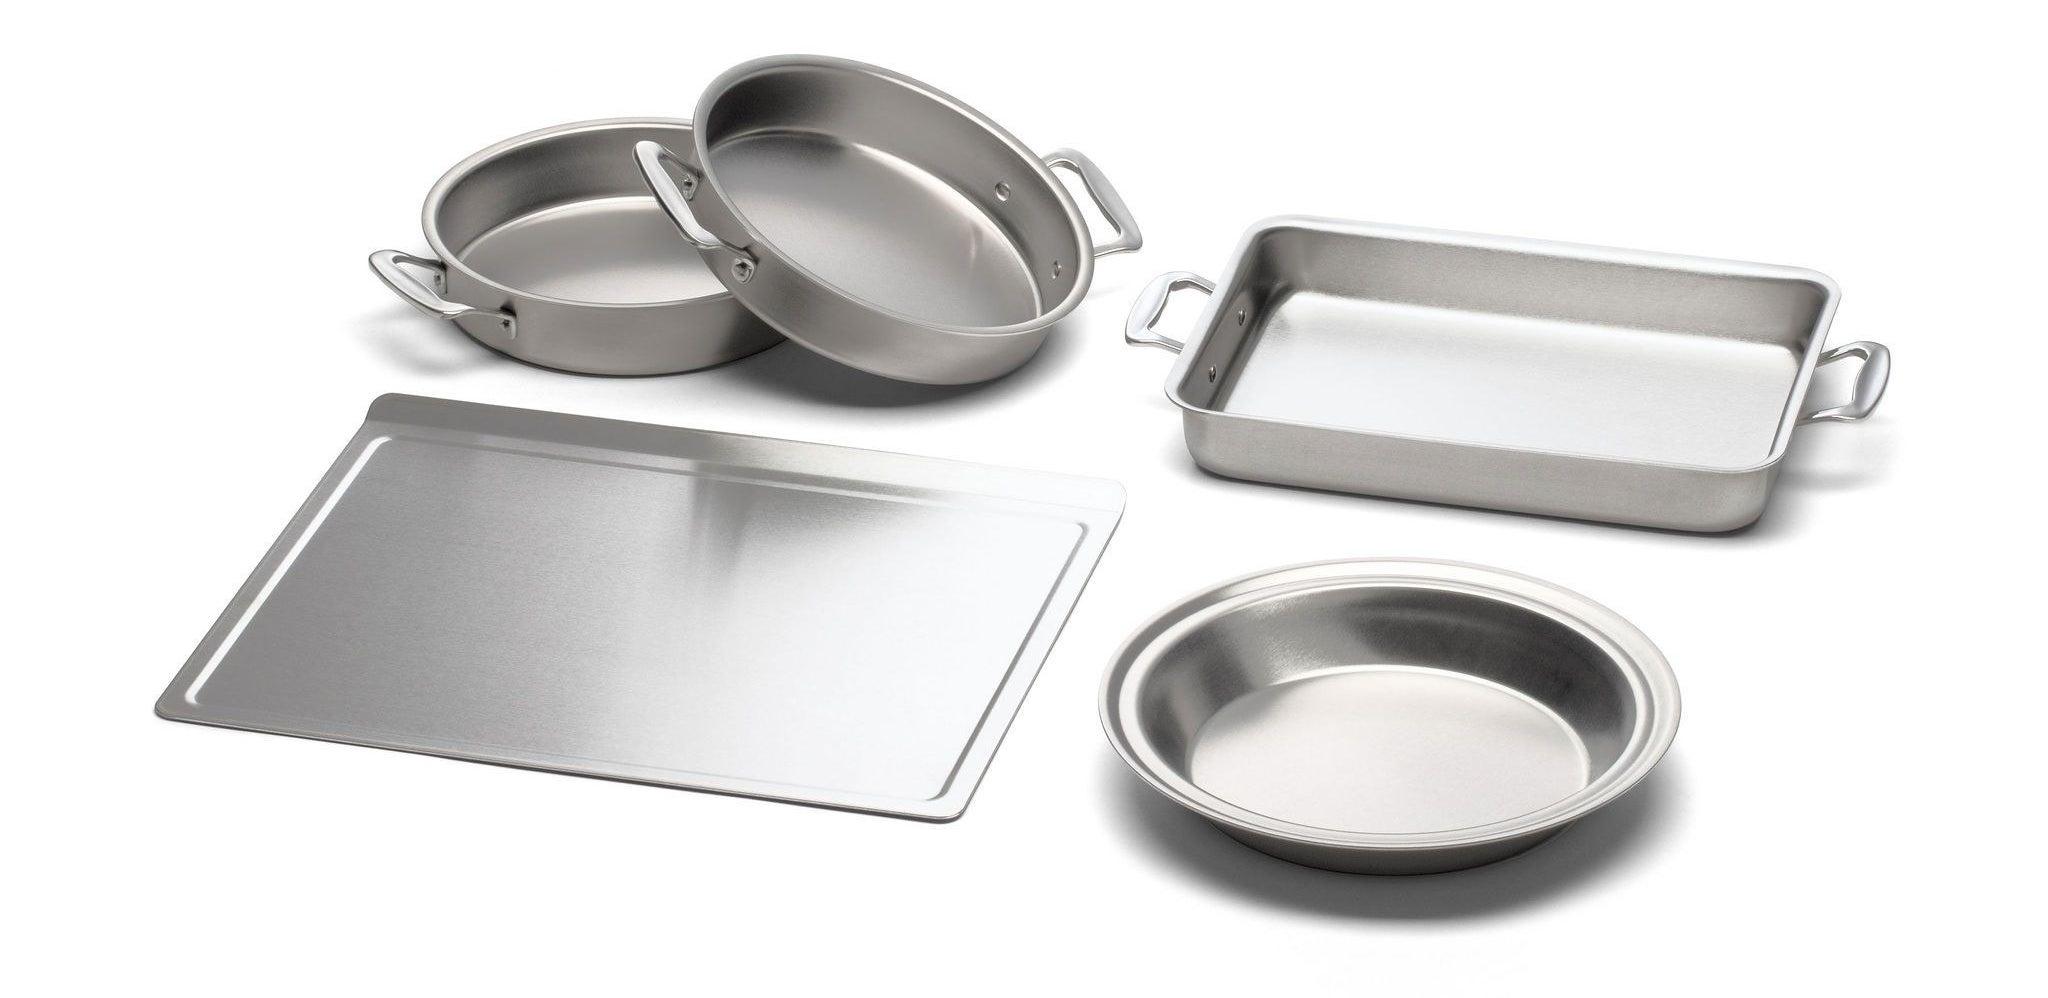 a sheet tray, three round pans, and a rectangular pan